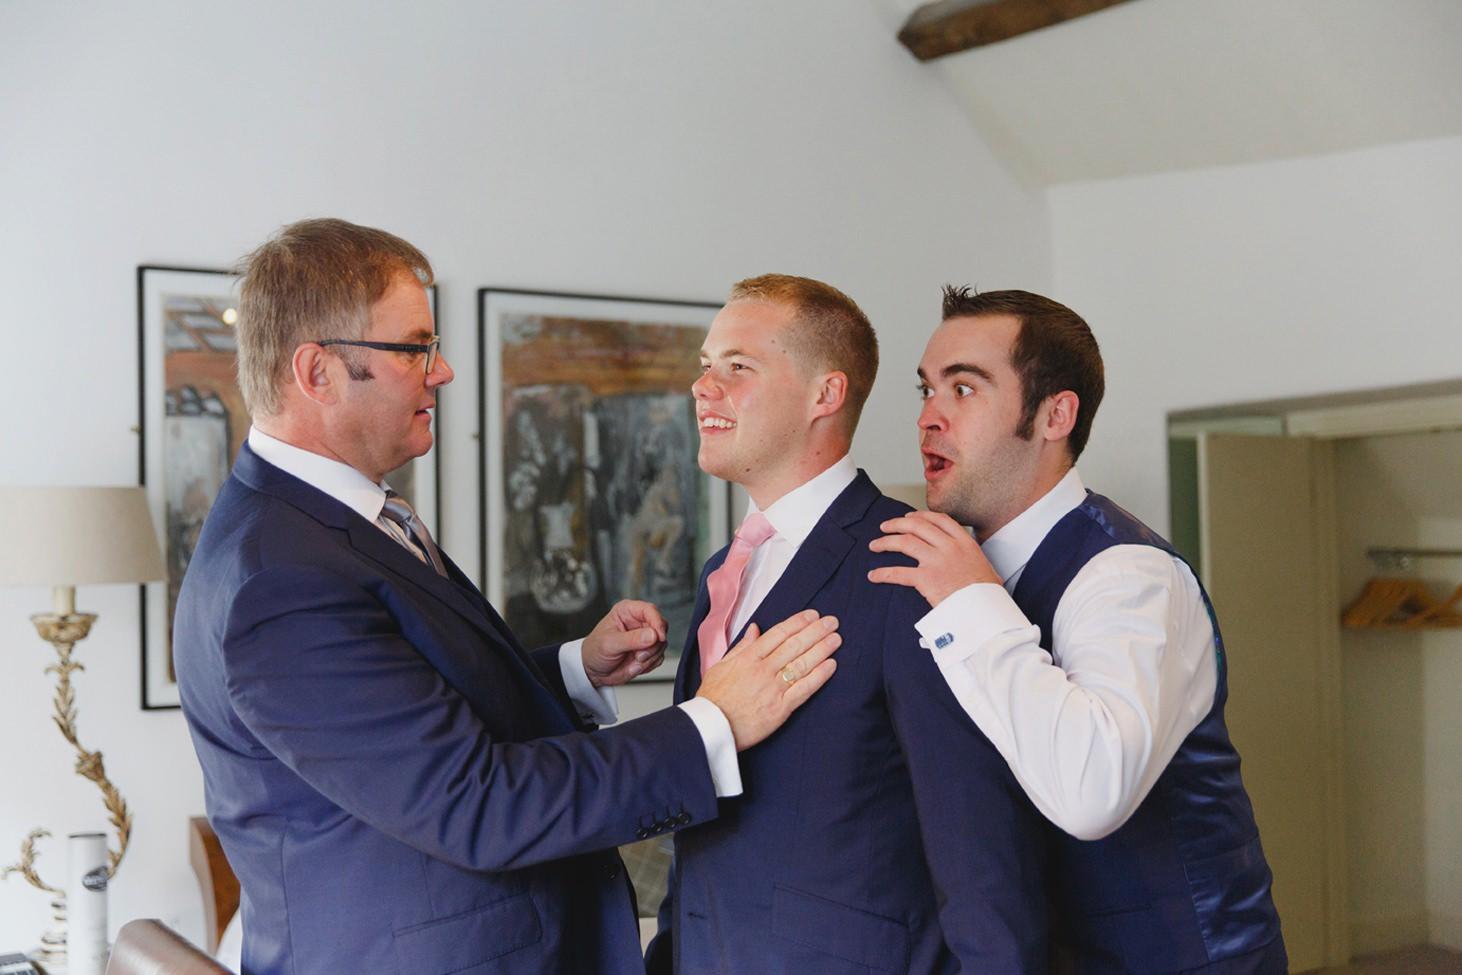 oxfordshire wedding photography groom and groomsmen